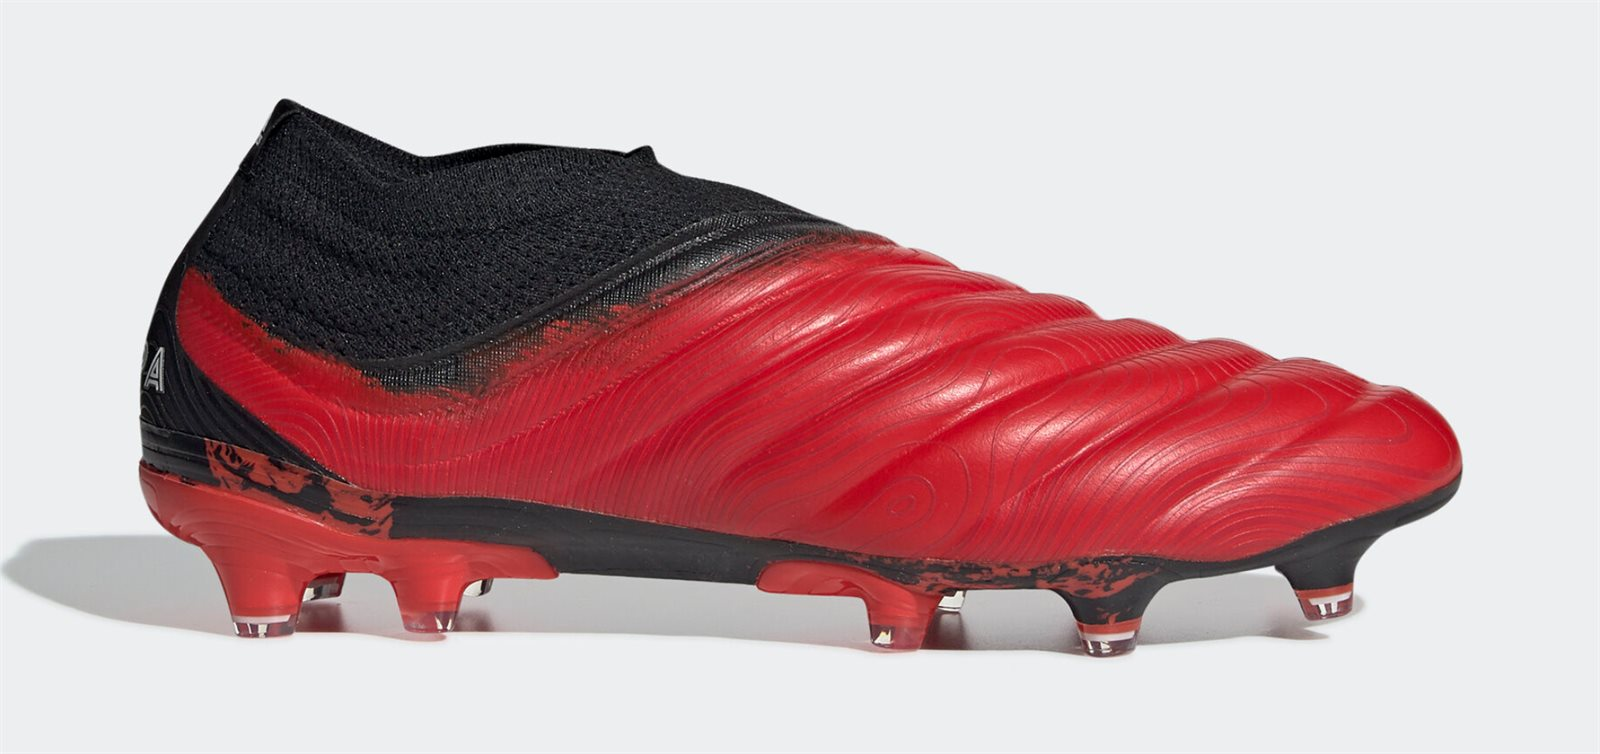 paulo dybala boots 2019